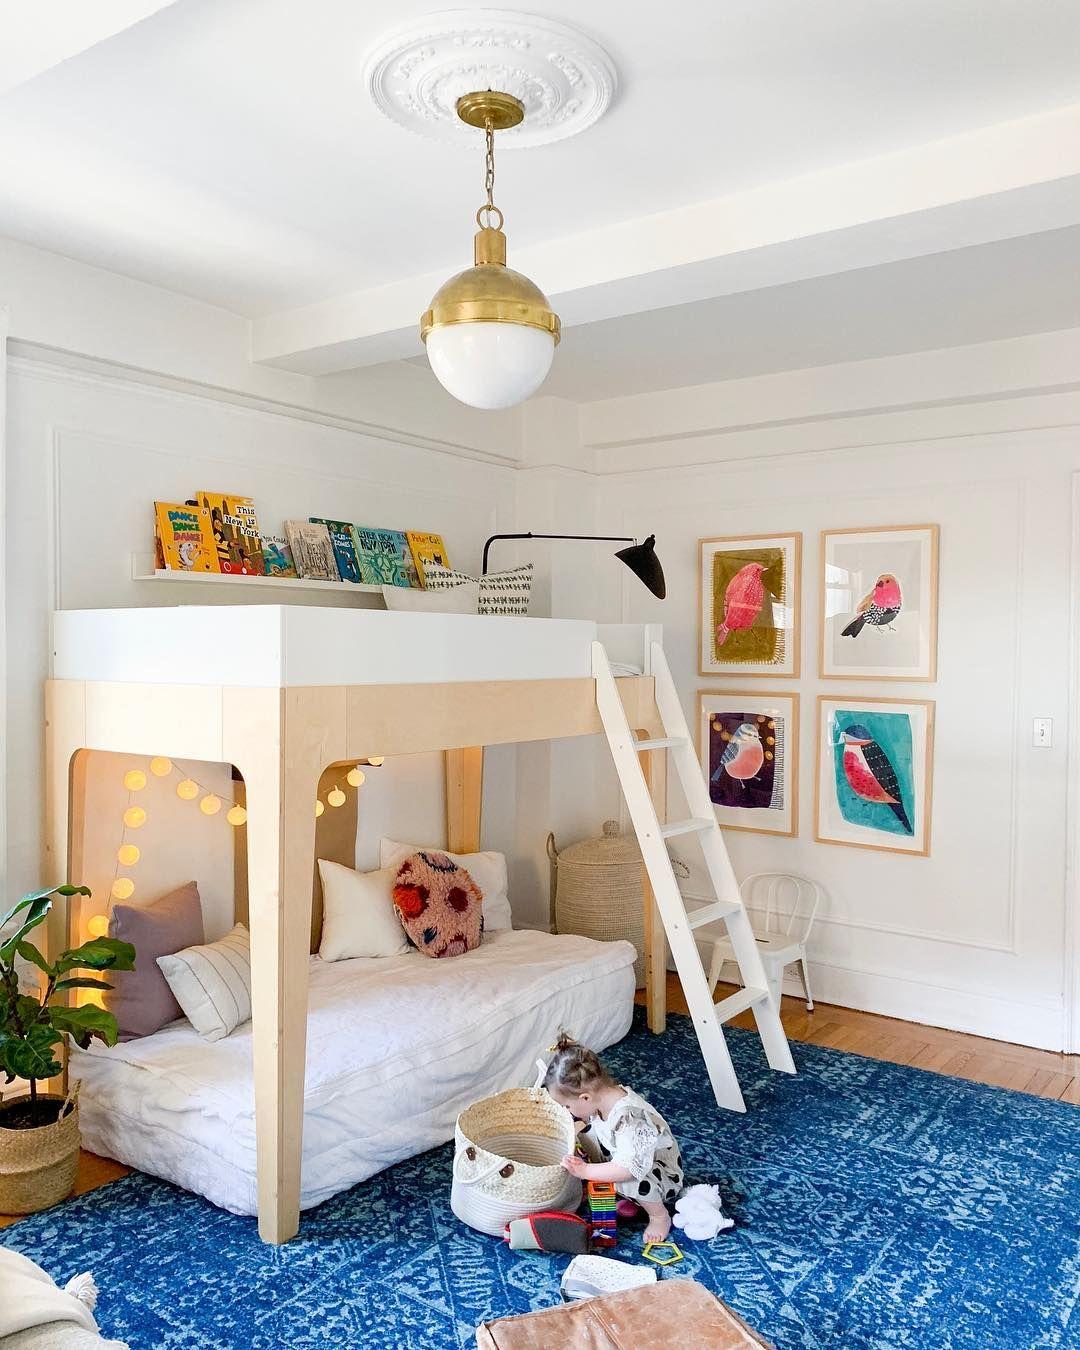 c r y s t a l on Instagram Oeuf nyc makes this bed Bunk